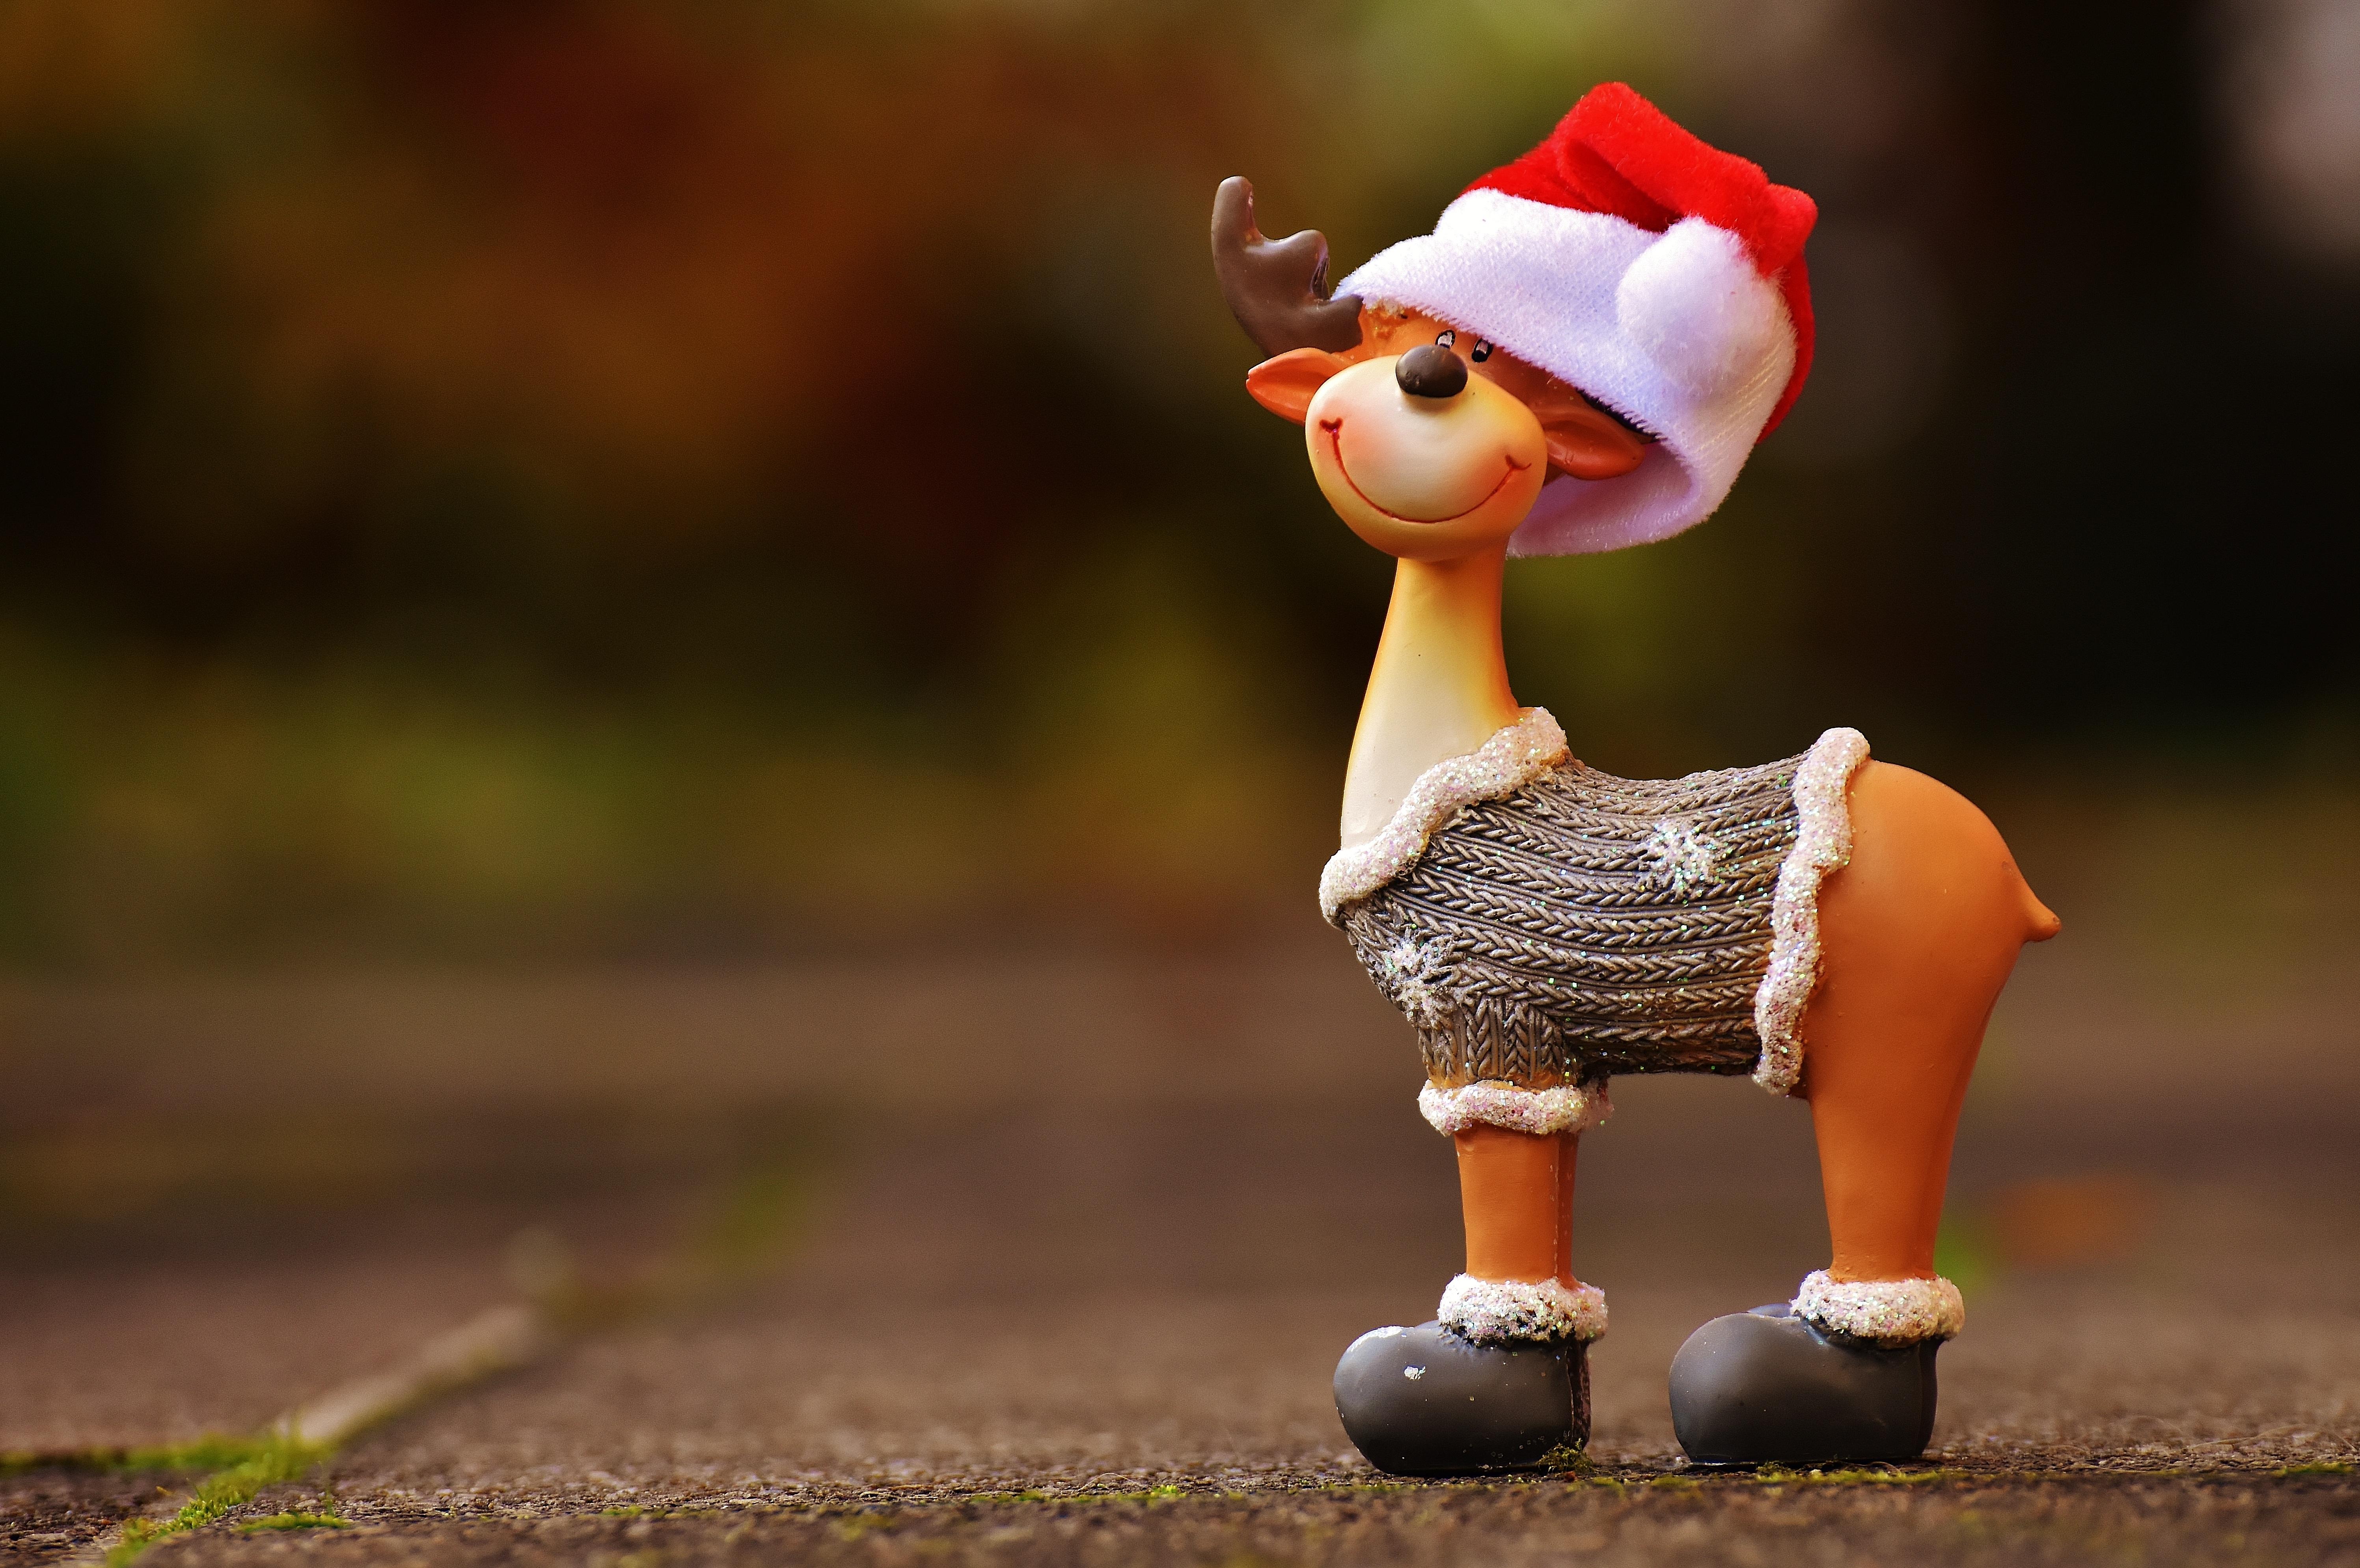 Gambar Musim Dingin Bermain Merah Anak Hari Natal Mainan